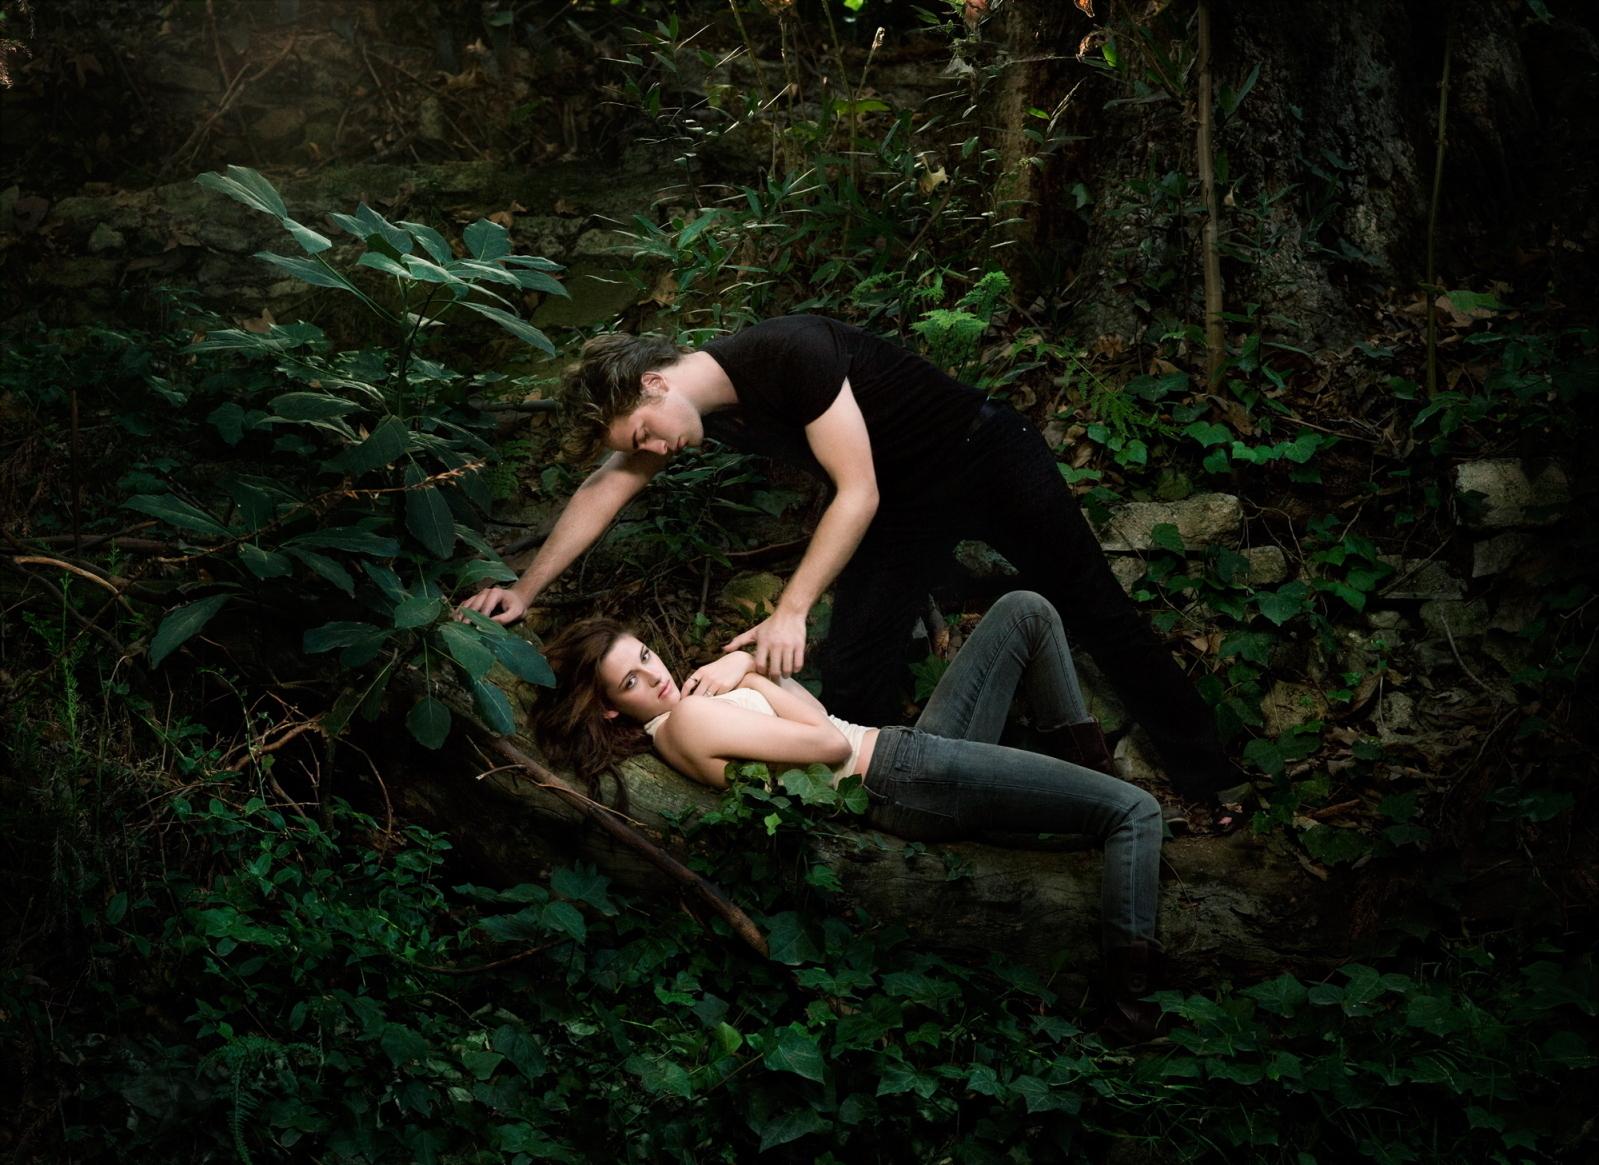 Edward and Bella(Twilight)